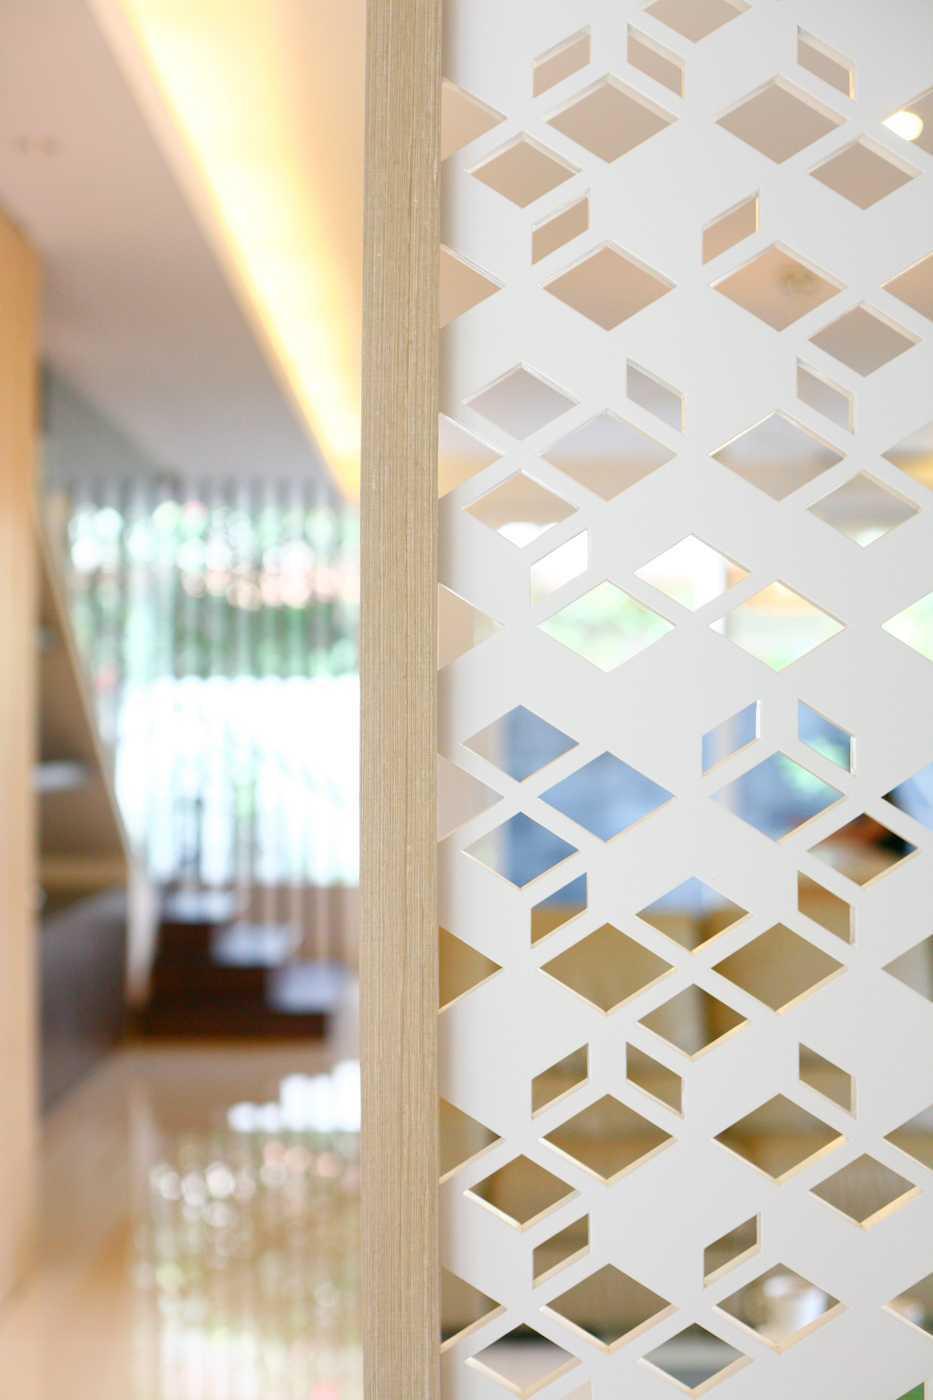 Herryj Architects Small House Tangerang Selatan Tangerang Selatan Img9835-Resize Tropis 23865